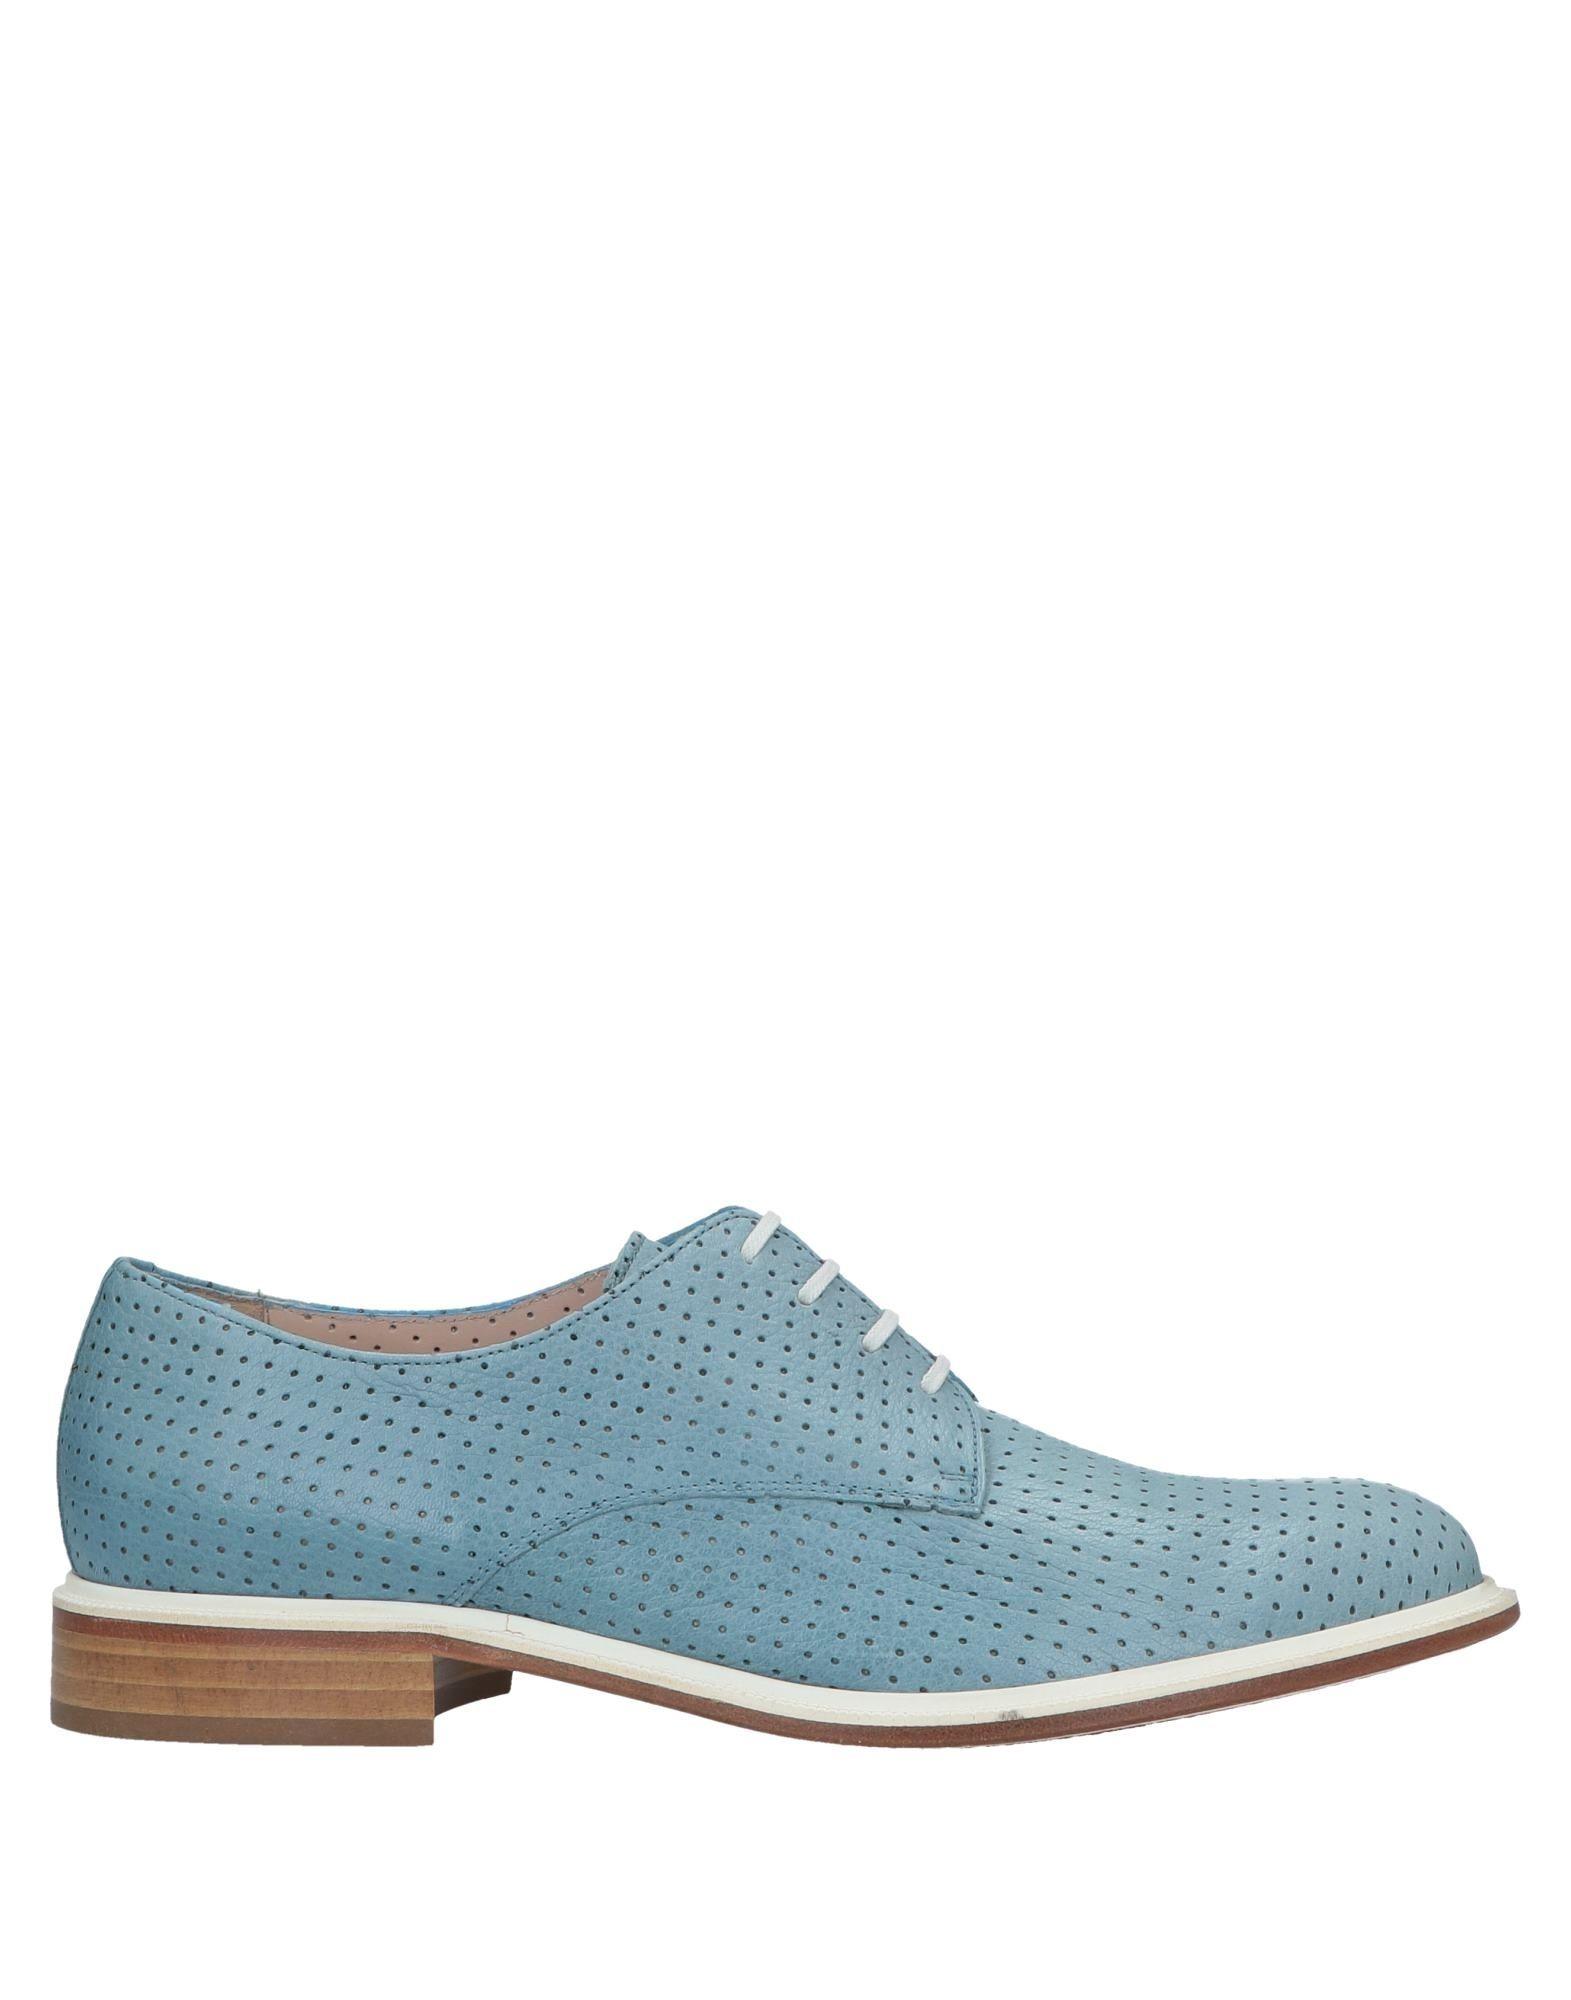 PERTINI Обувь на шнурках обувь 2015 тренды